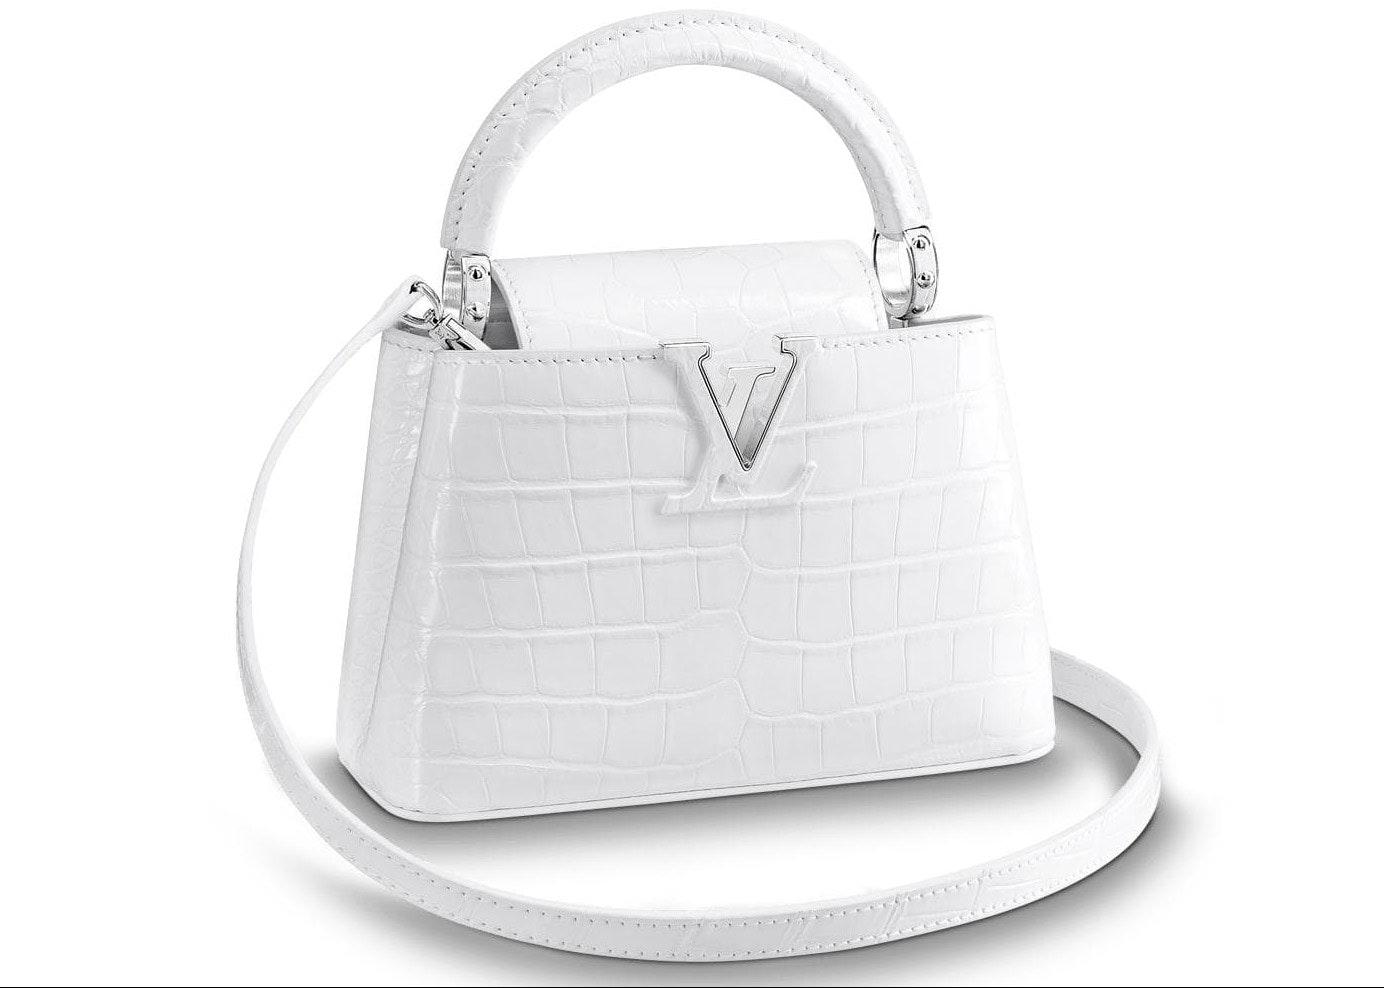 Louis Vuitton Capucines Crocodile Leather Silver-tone Mini Blanc